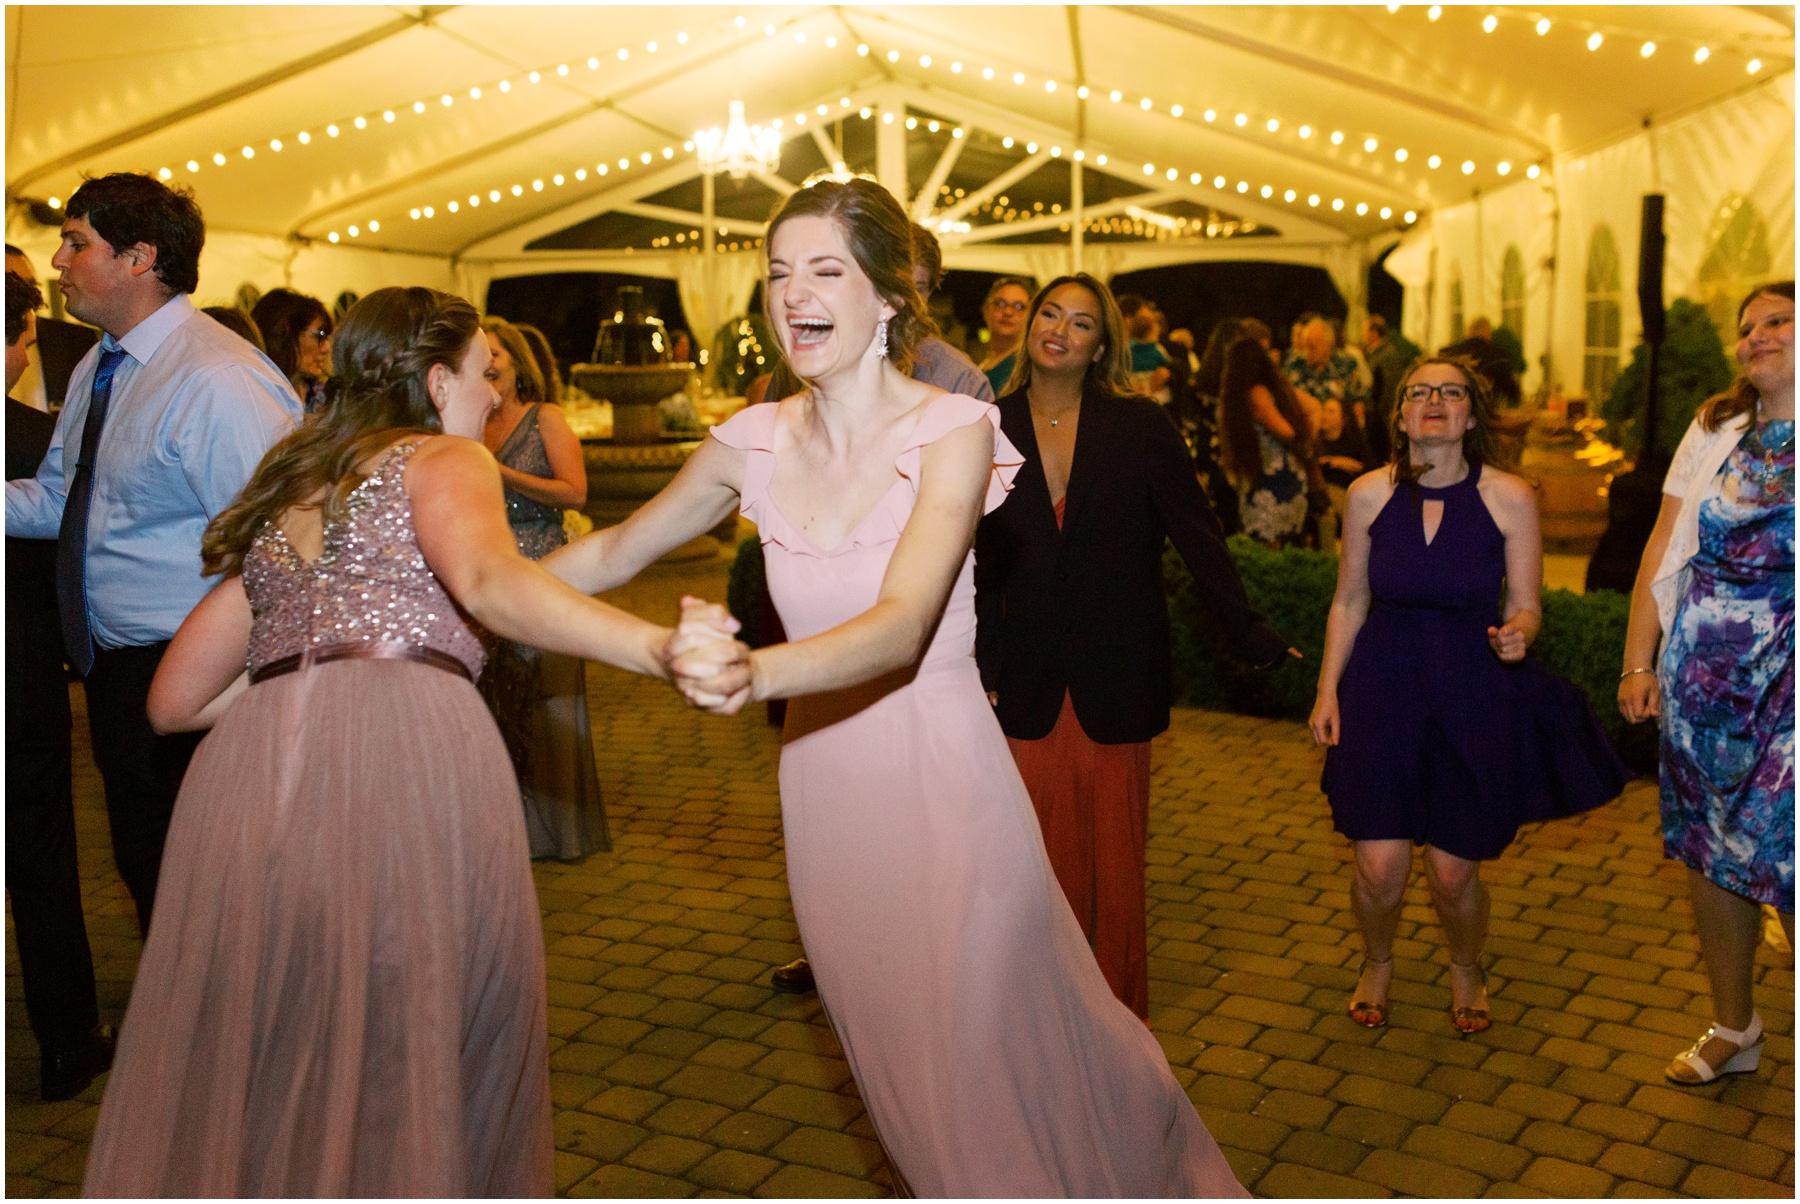 Scribner-bend-vineyards-wedding-sacramento-california-Kristine-Herman-Photography-212.jpg